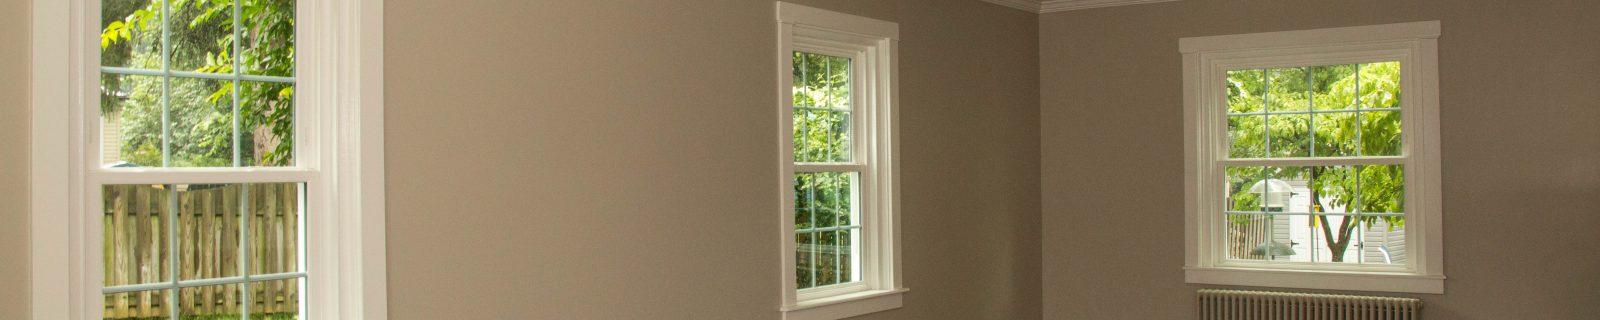 window installation of multiple windows